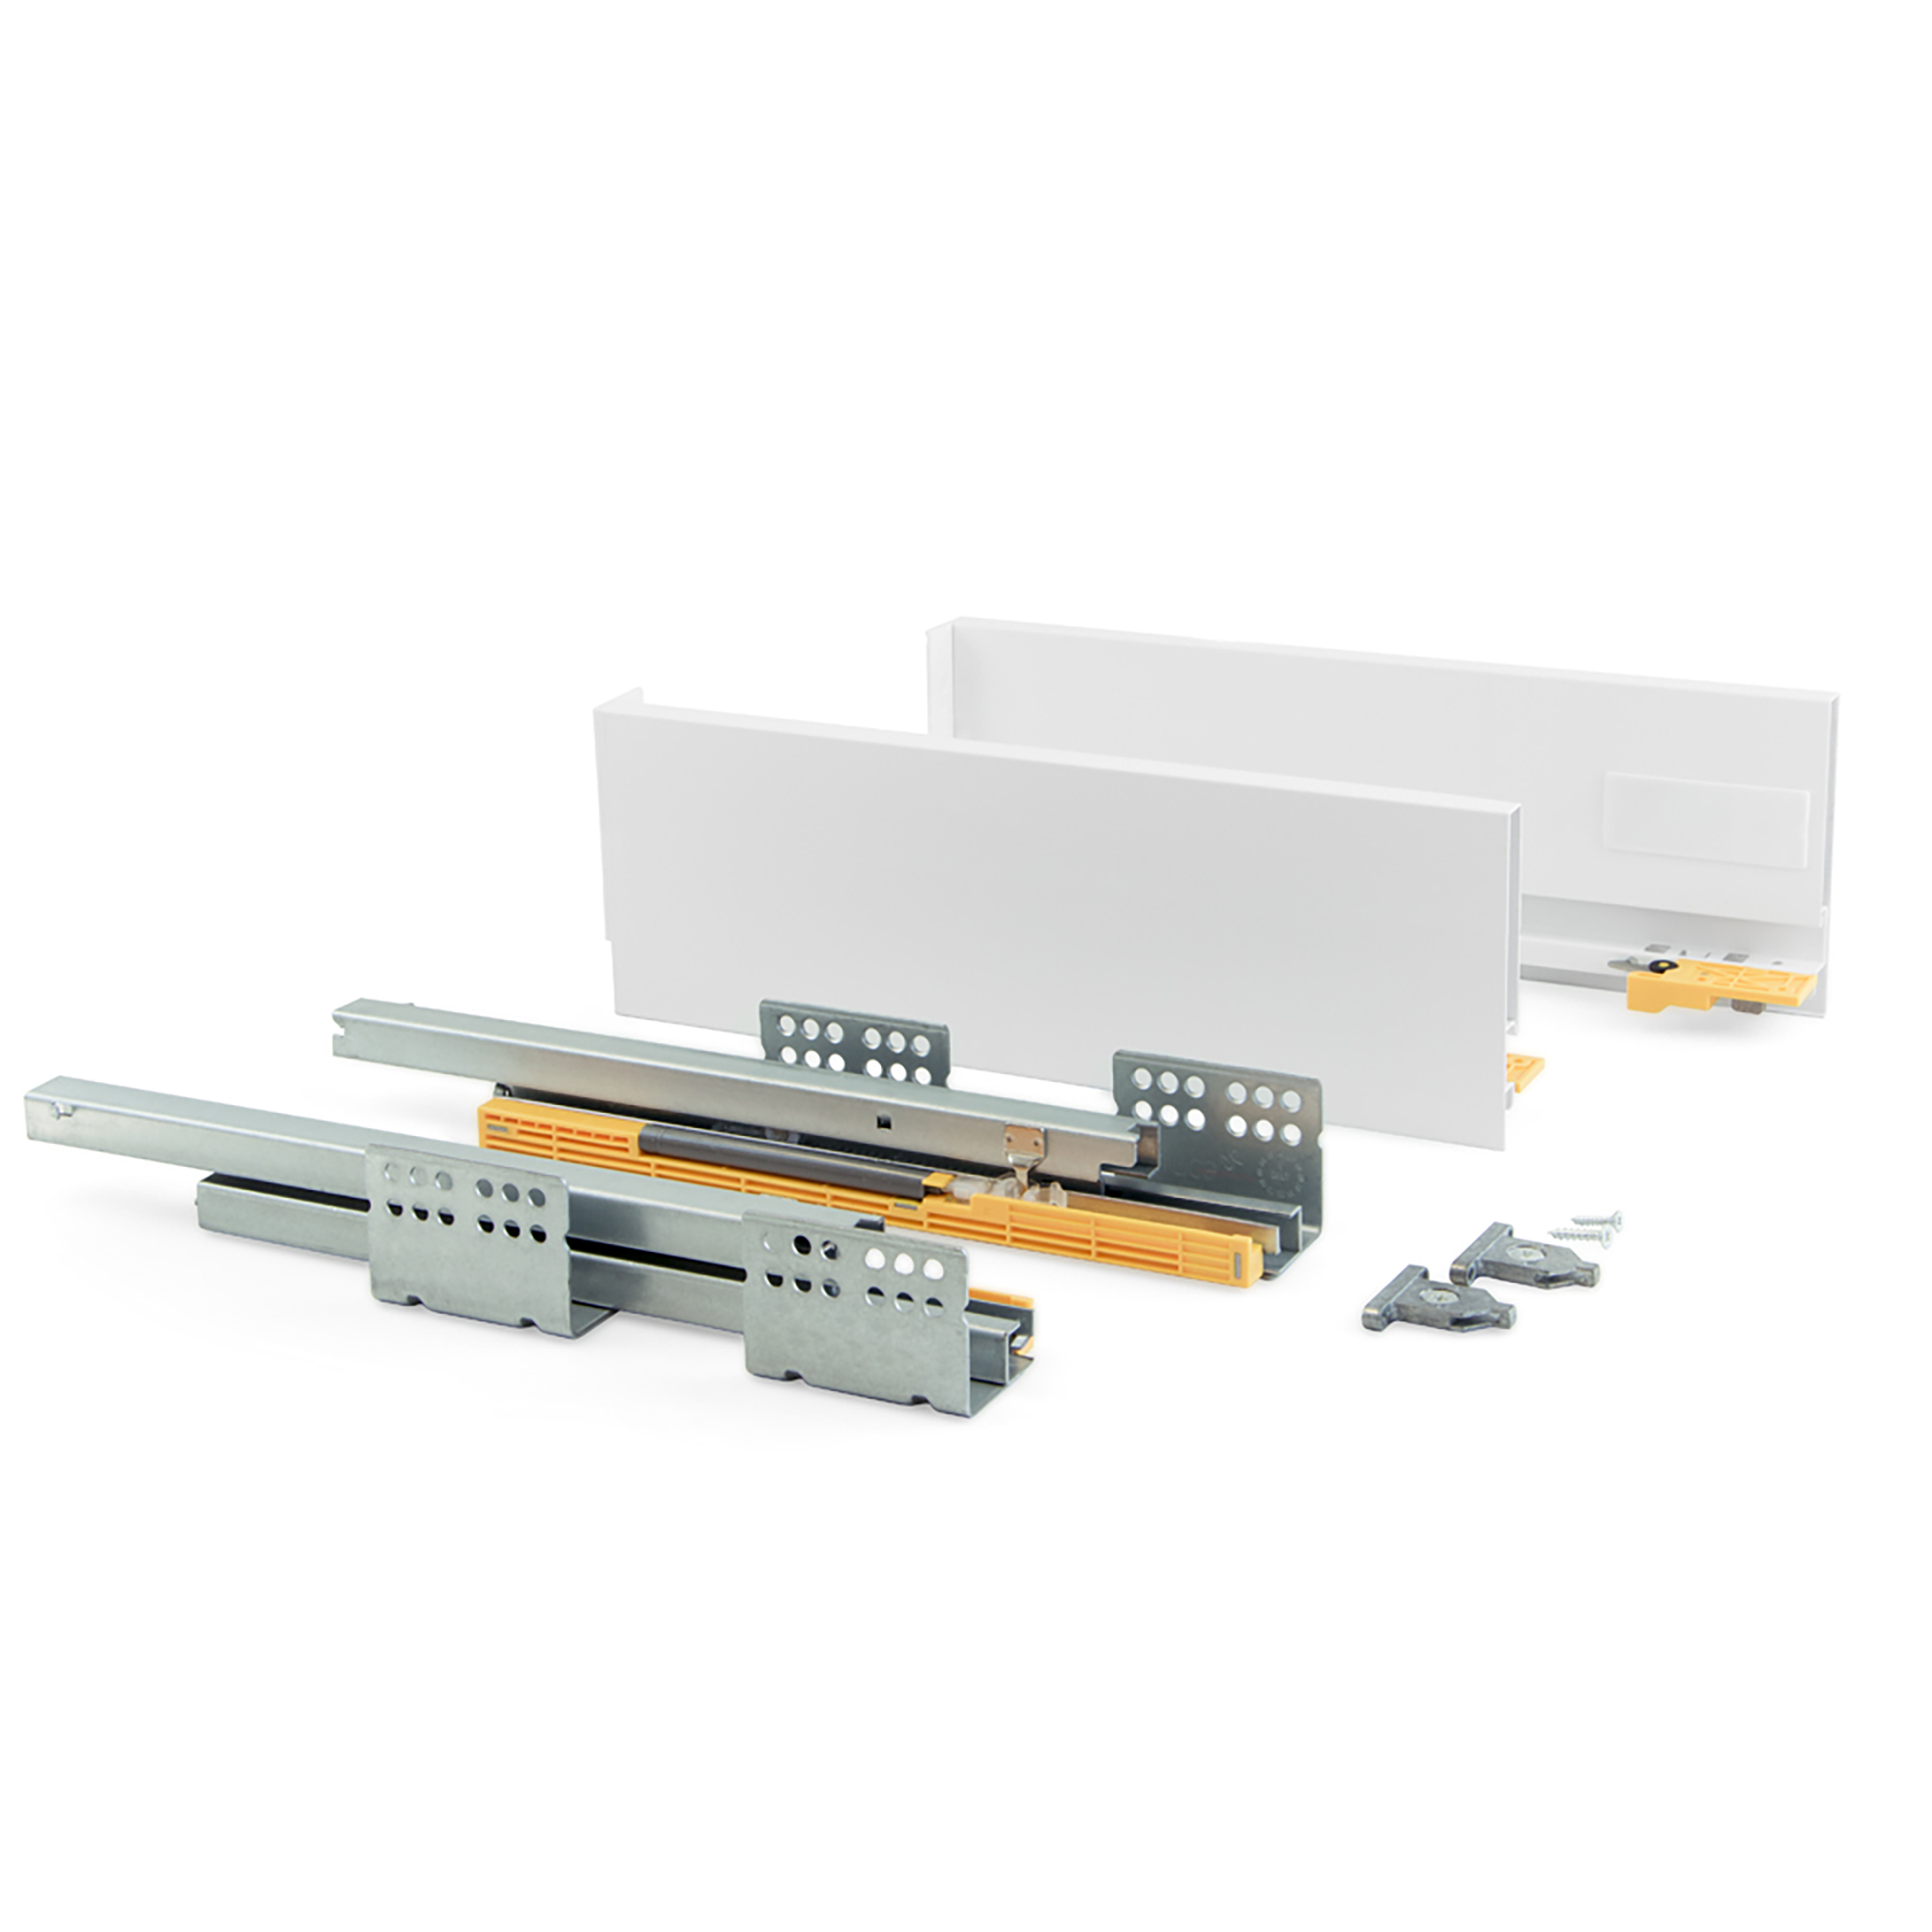 Emuca Kit cassetto per cucina Concept, 50 Kg, altezza 138 mm, prof. 500 mm, chiusura soft, Acciaio, Bianco